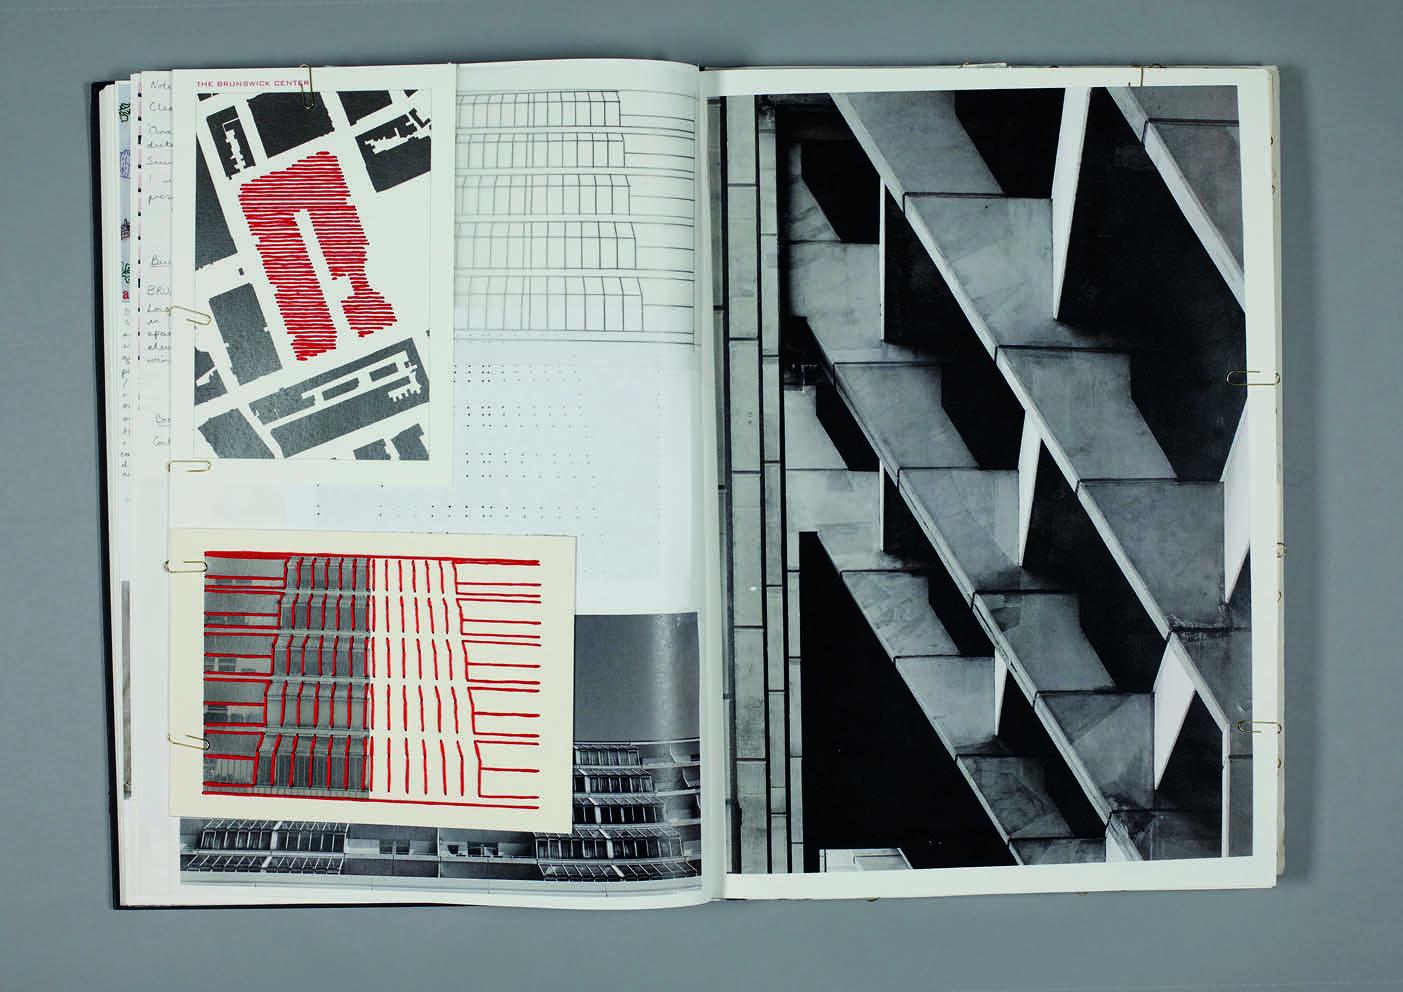 Design by Mils The Brunswick Centre Sketchbook Page